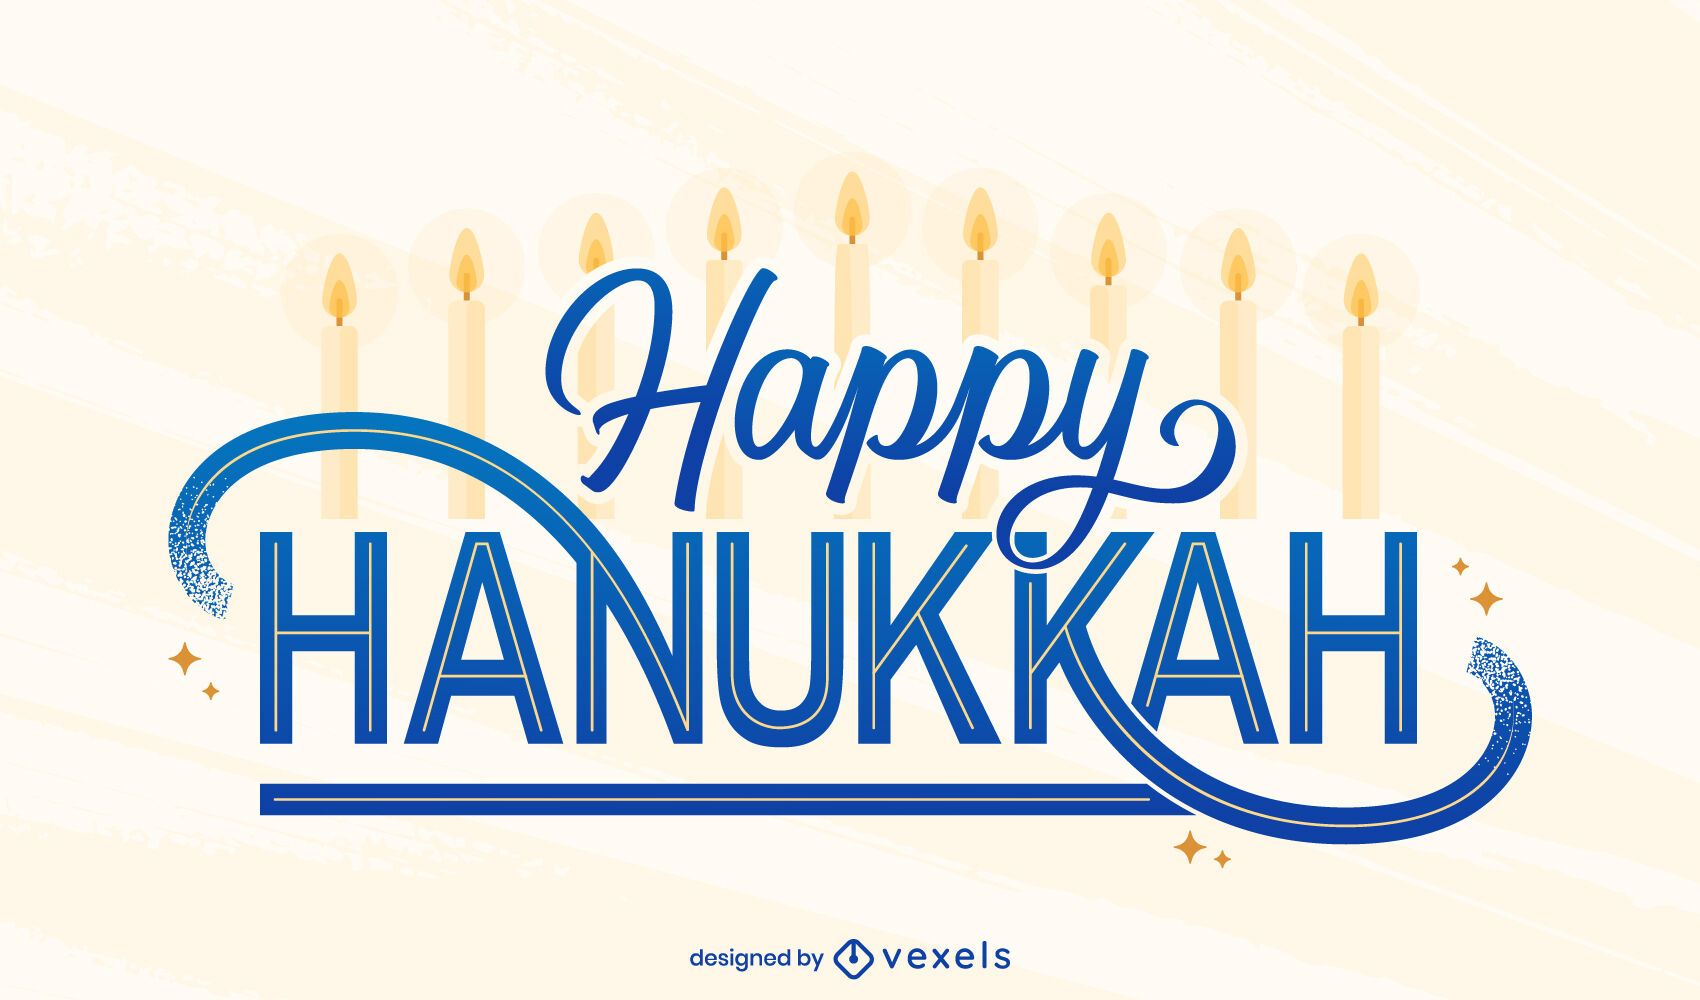 Happy hanukkah holiday lettering design